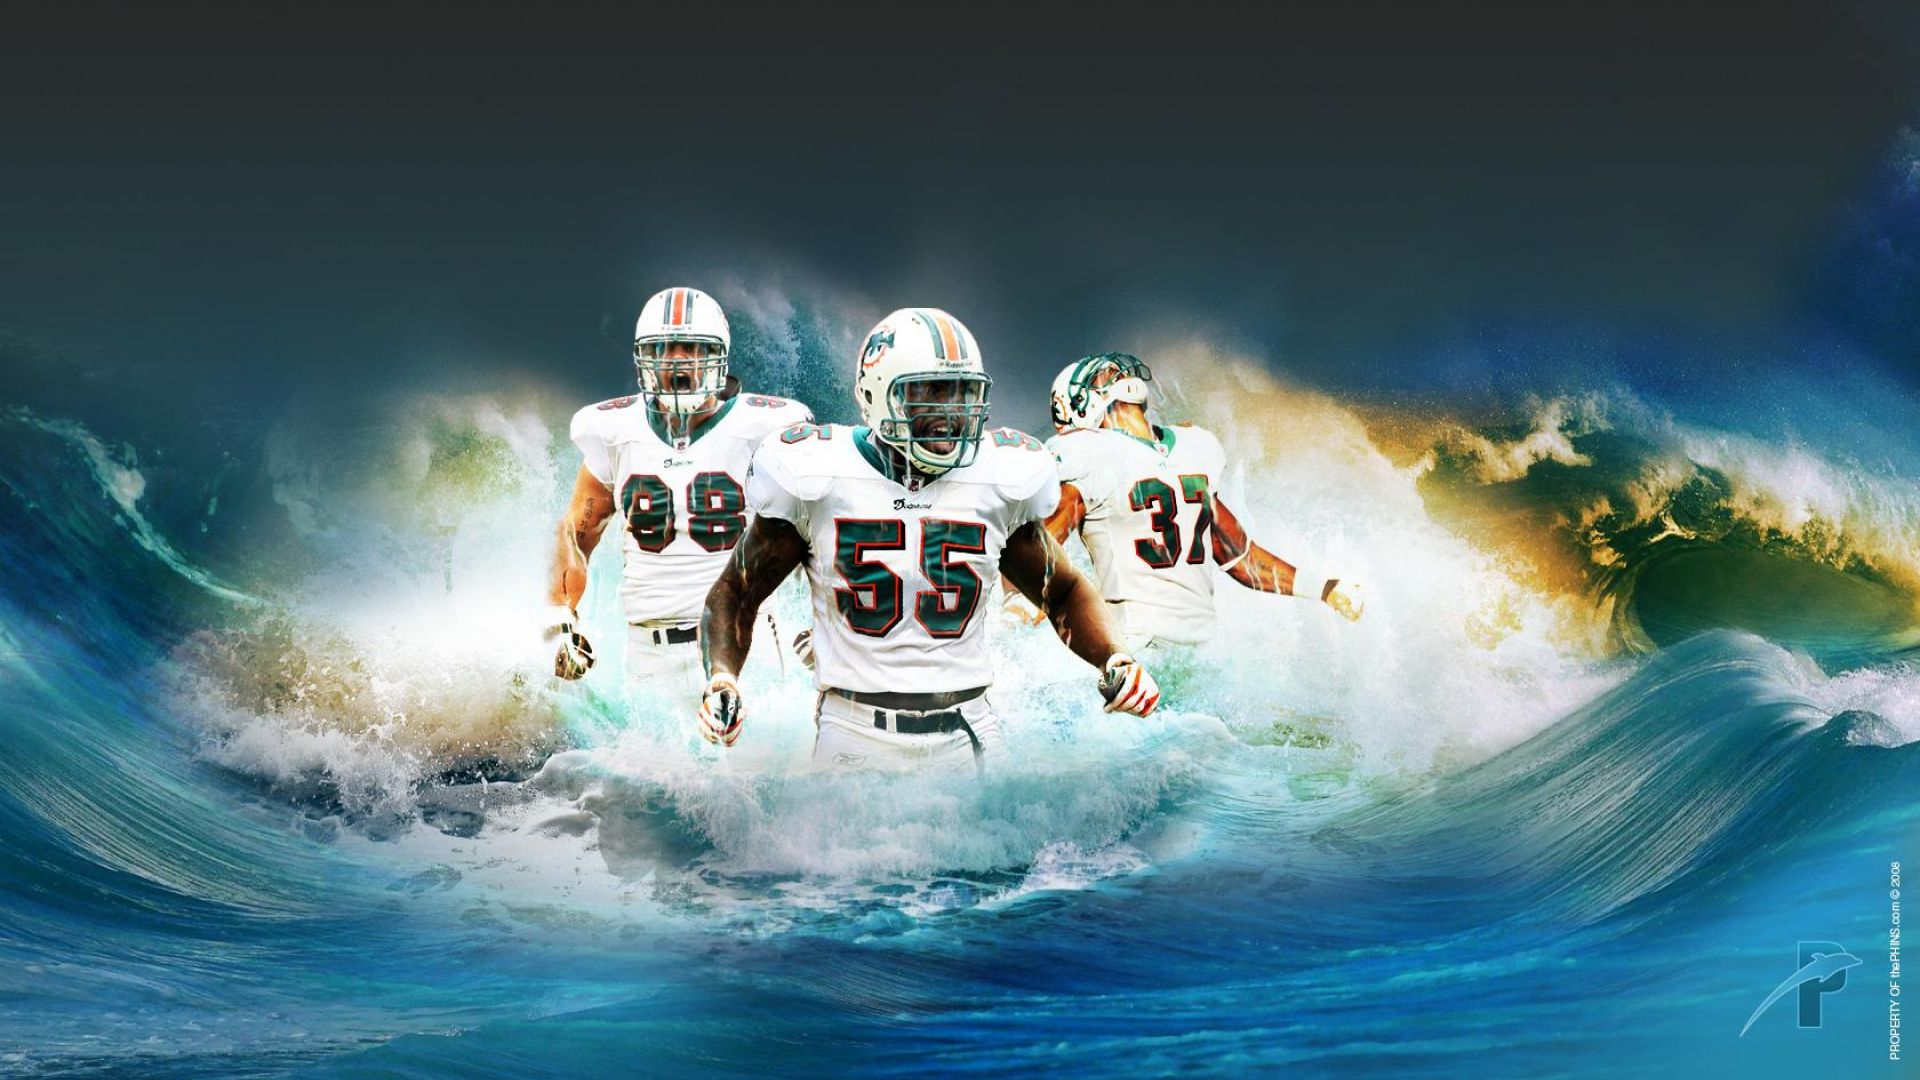 NFL Miami Dolphins Wallpaper